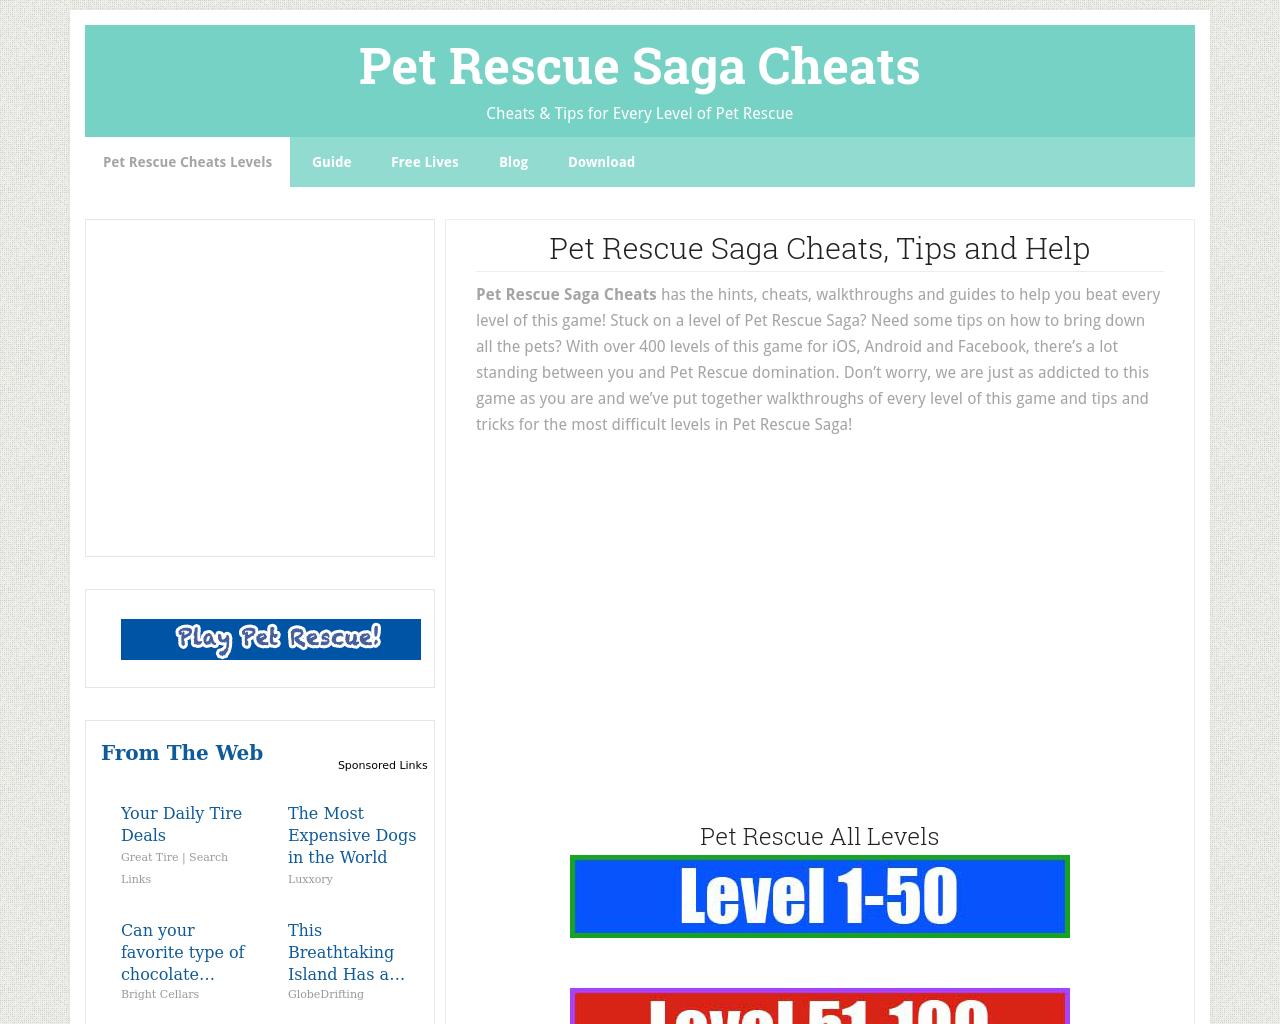 Pet-Rescue-Saga-Cheats-Advertising-Reviews-Pricing